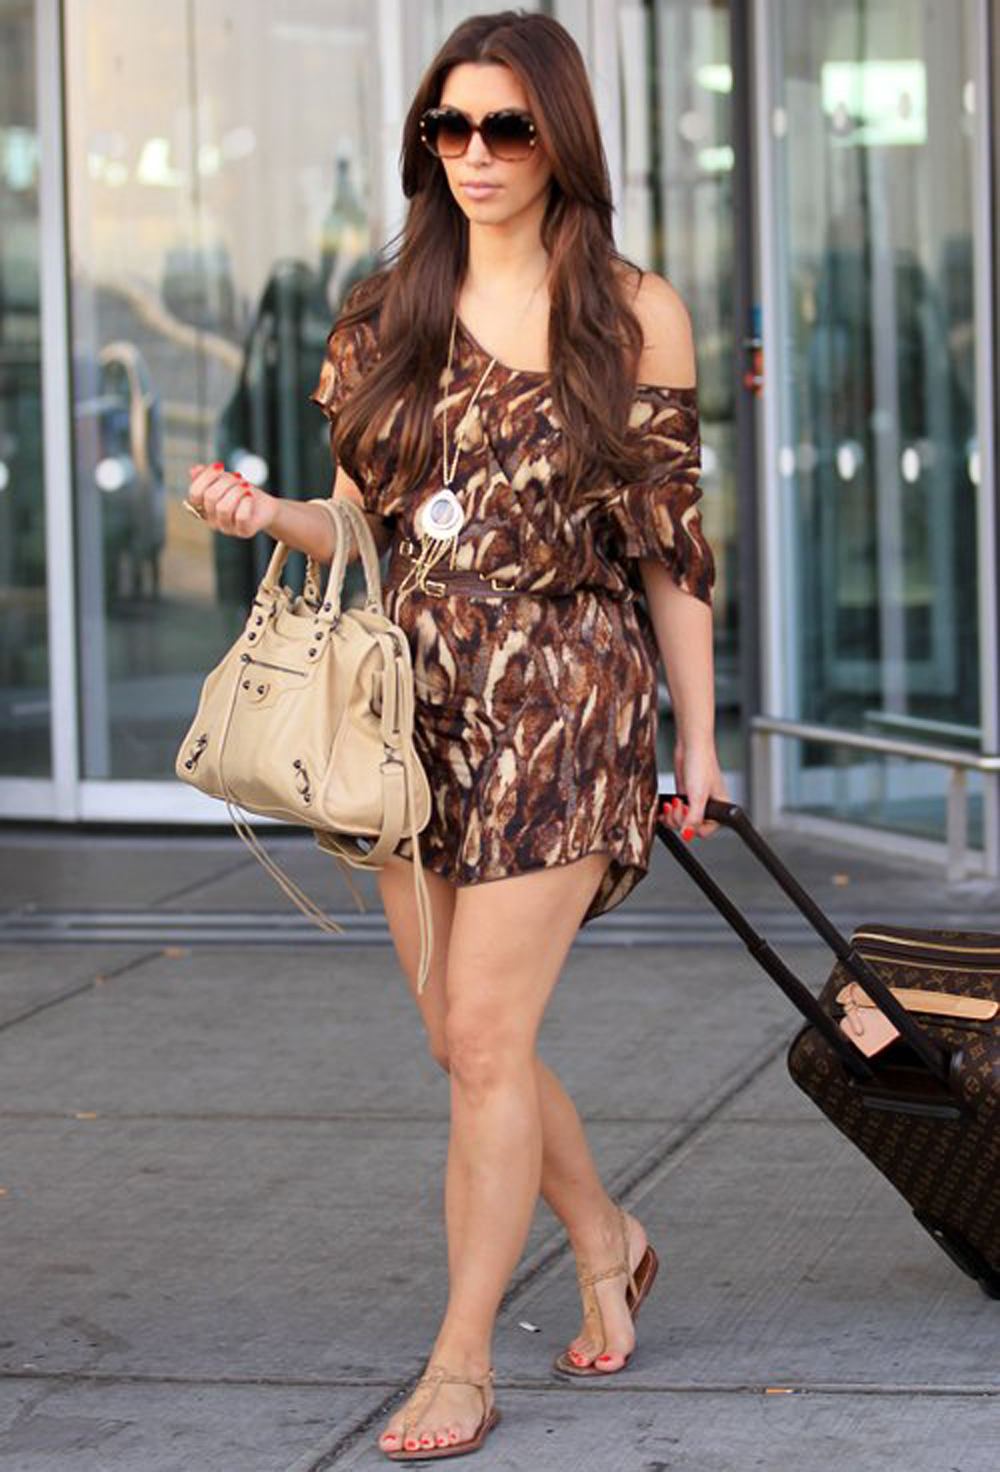 Kim Kardashian Long Wavy Hairstyles 04